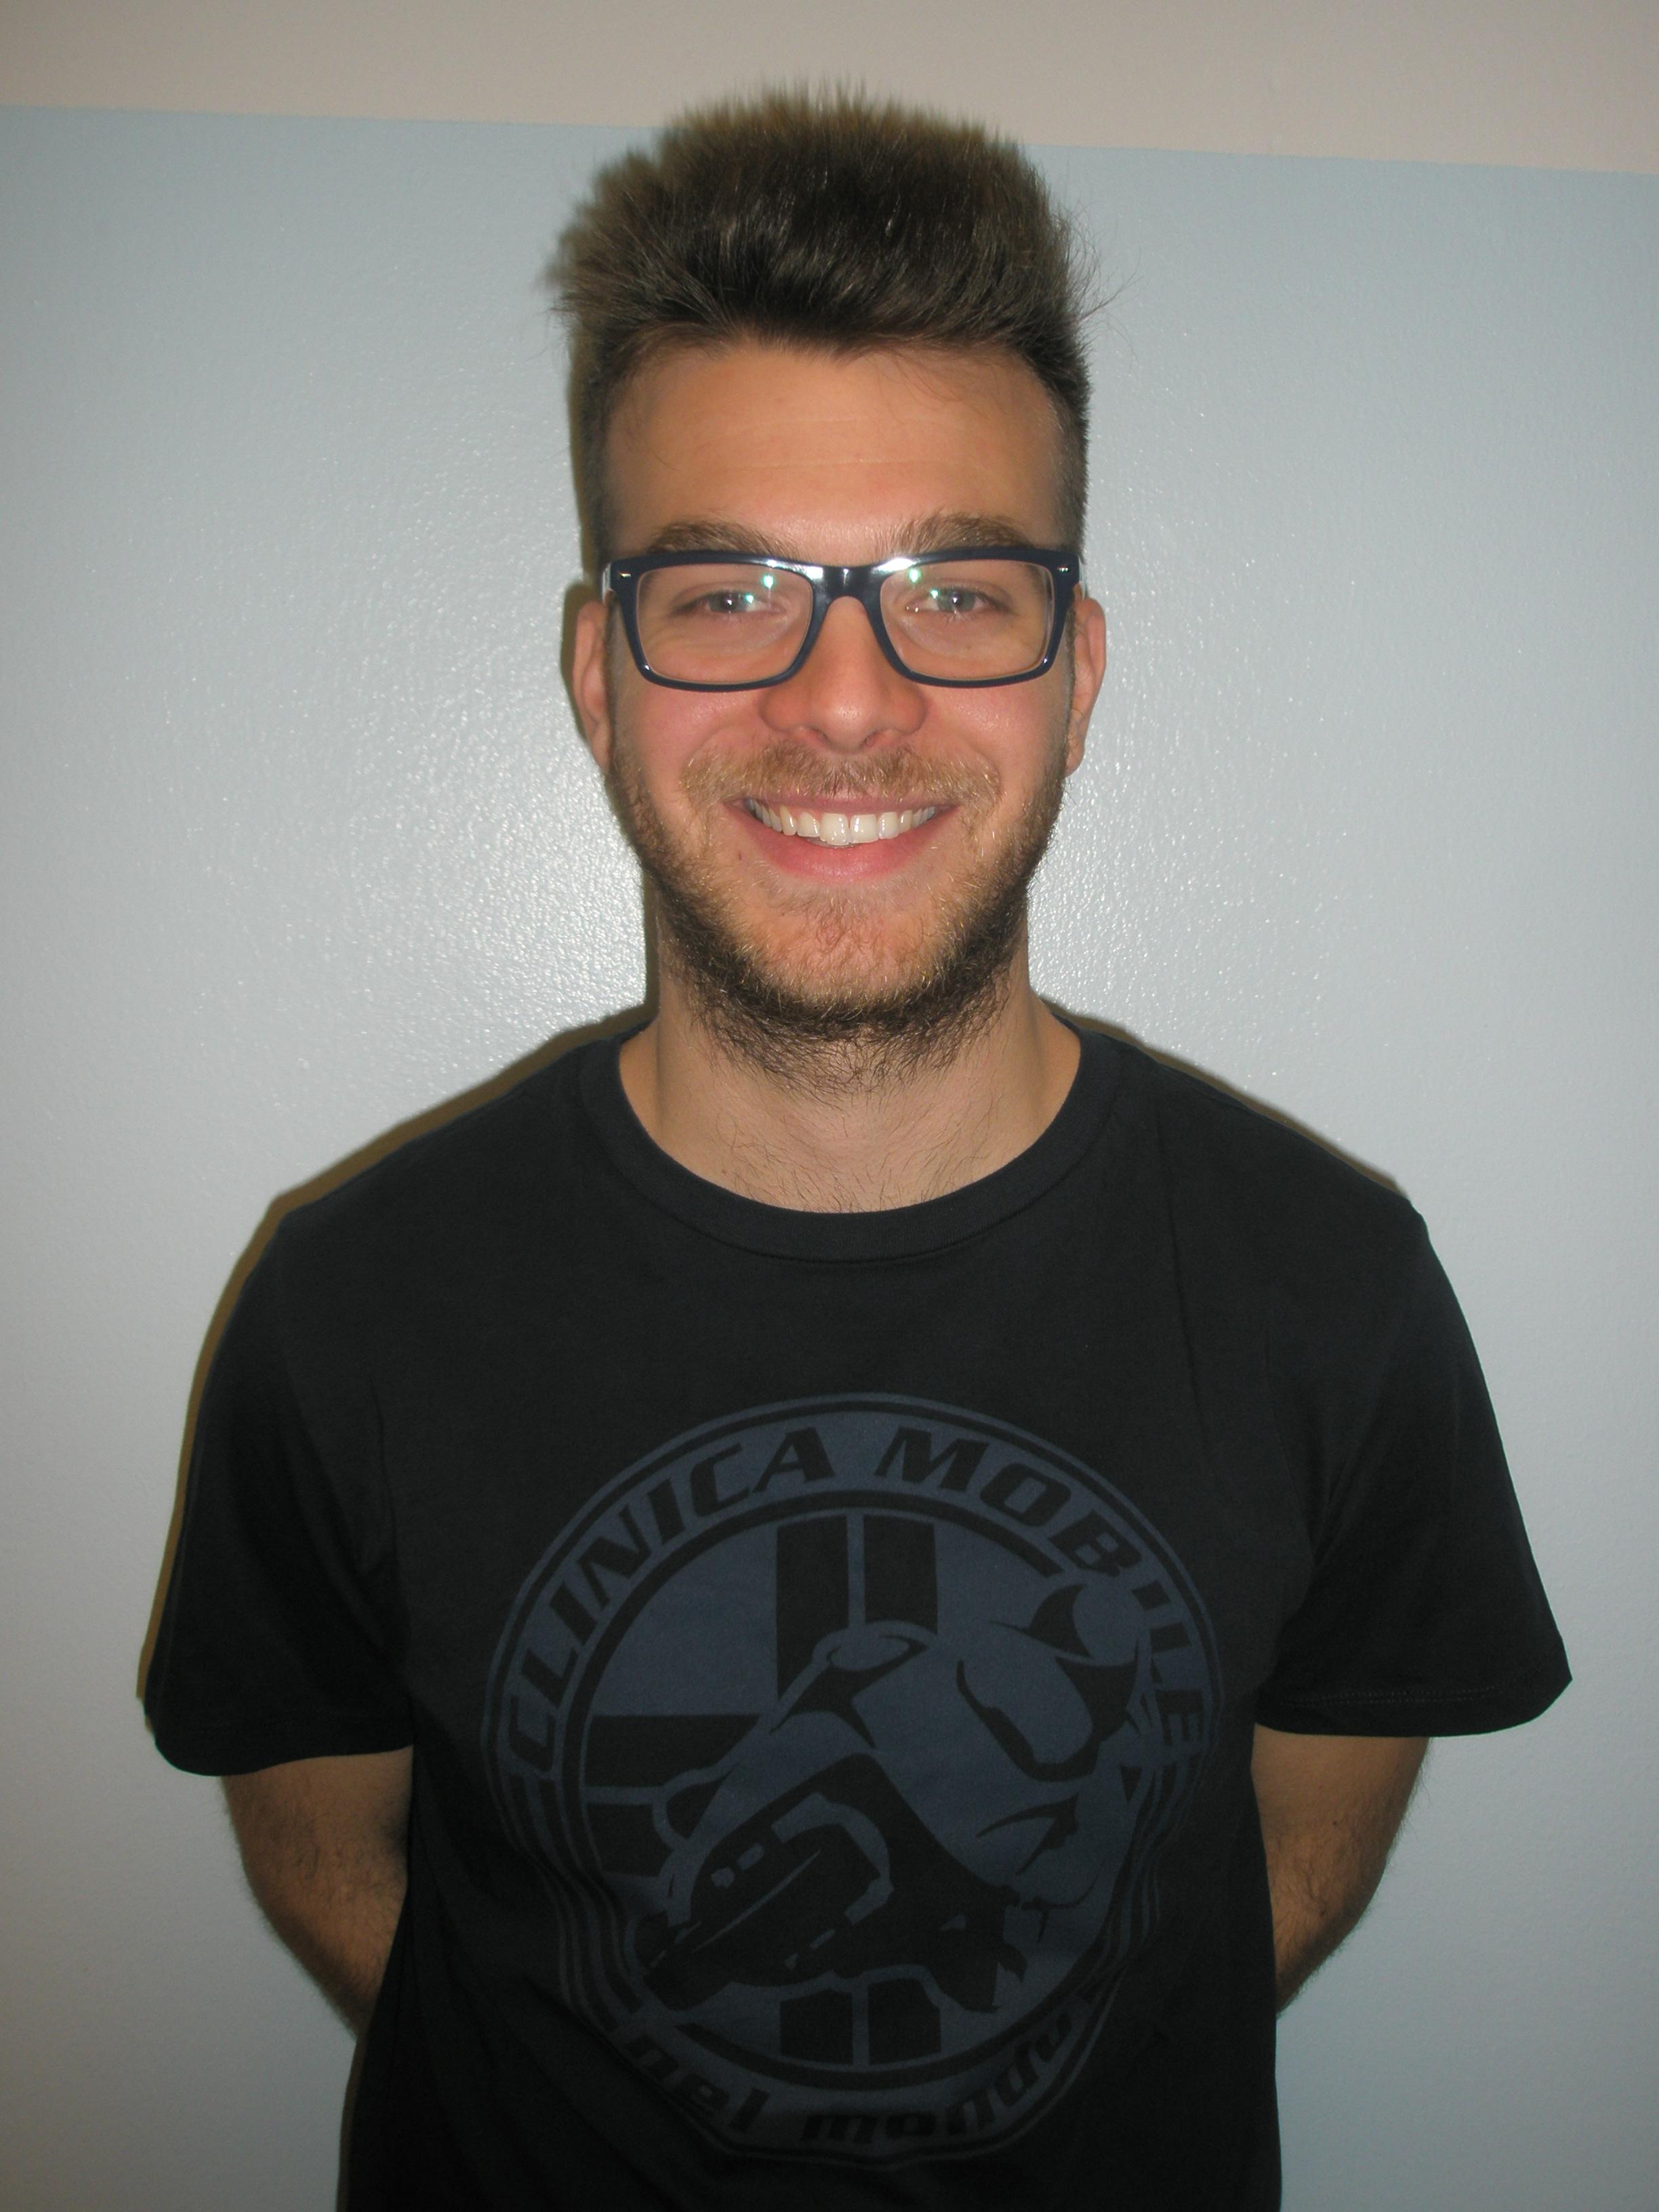 Luca Dal Molin